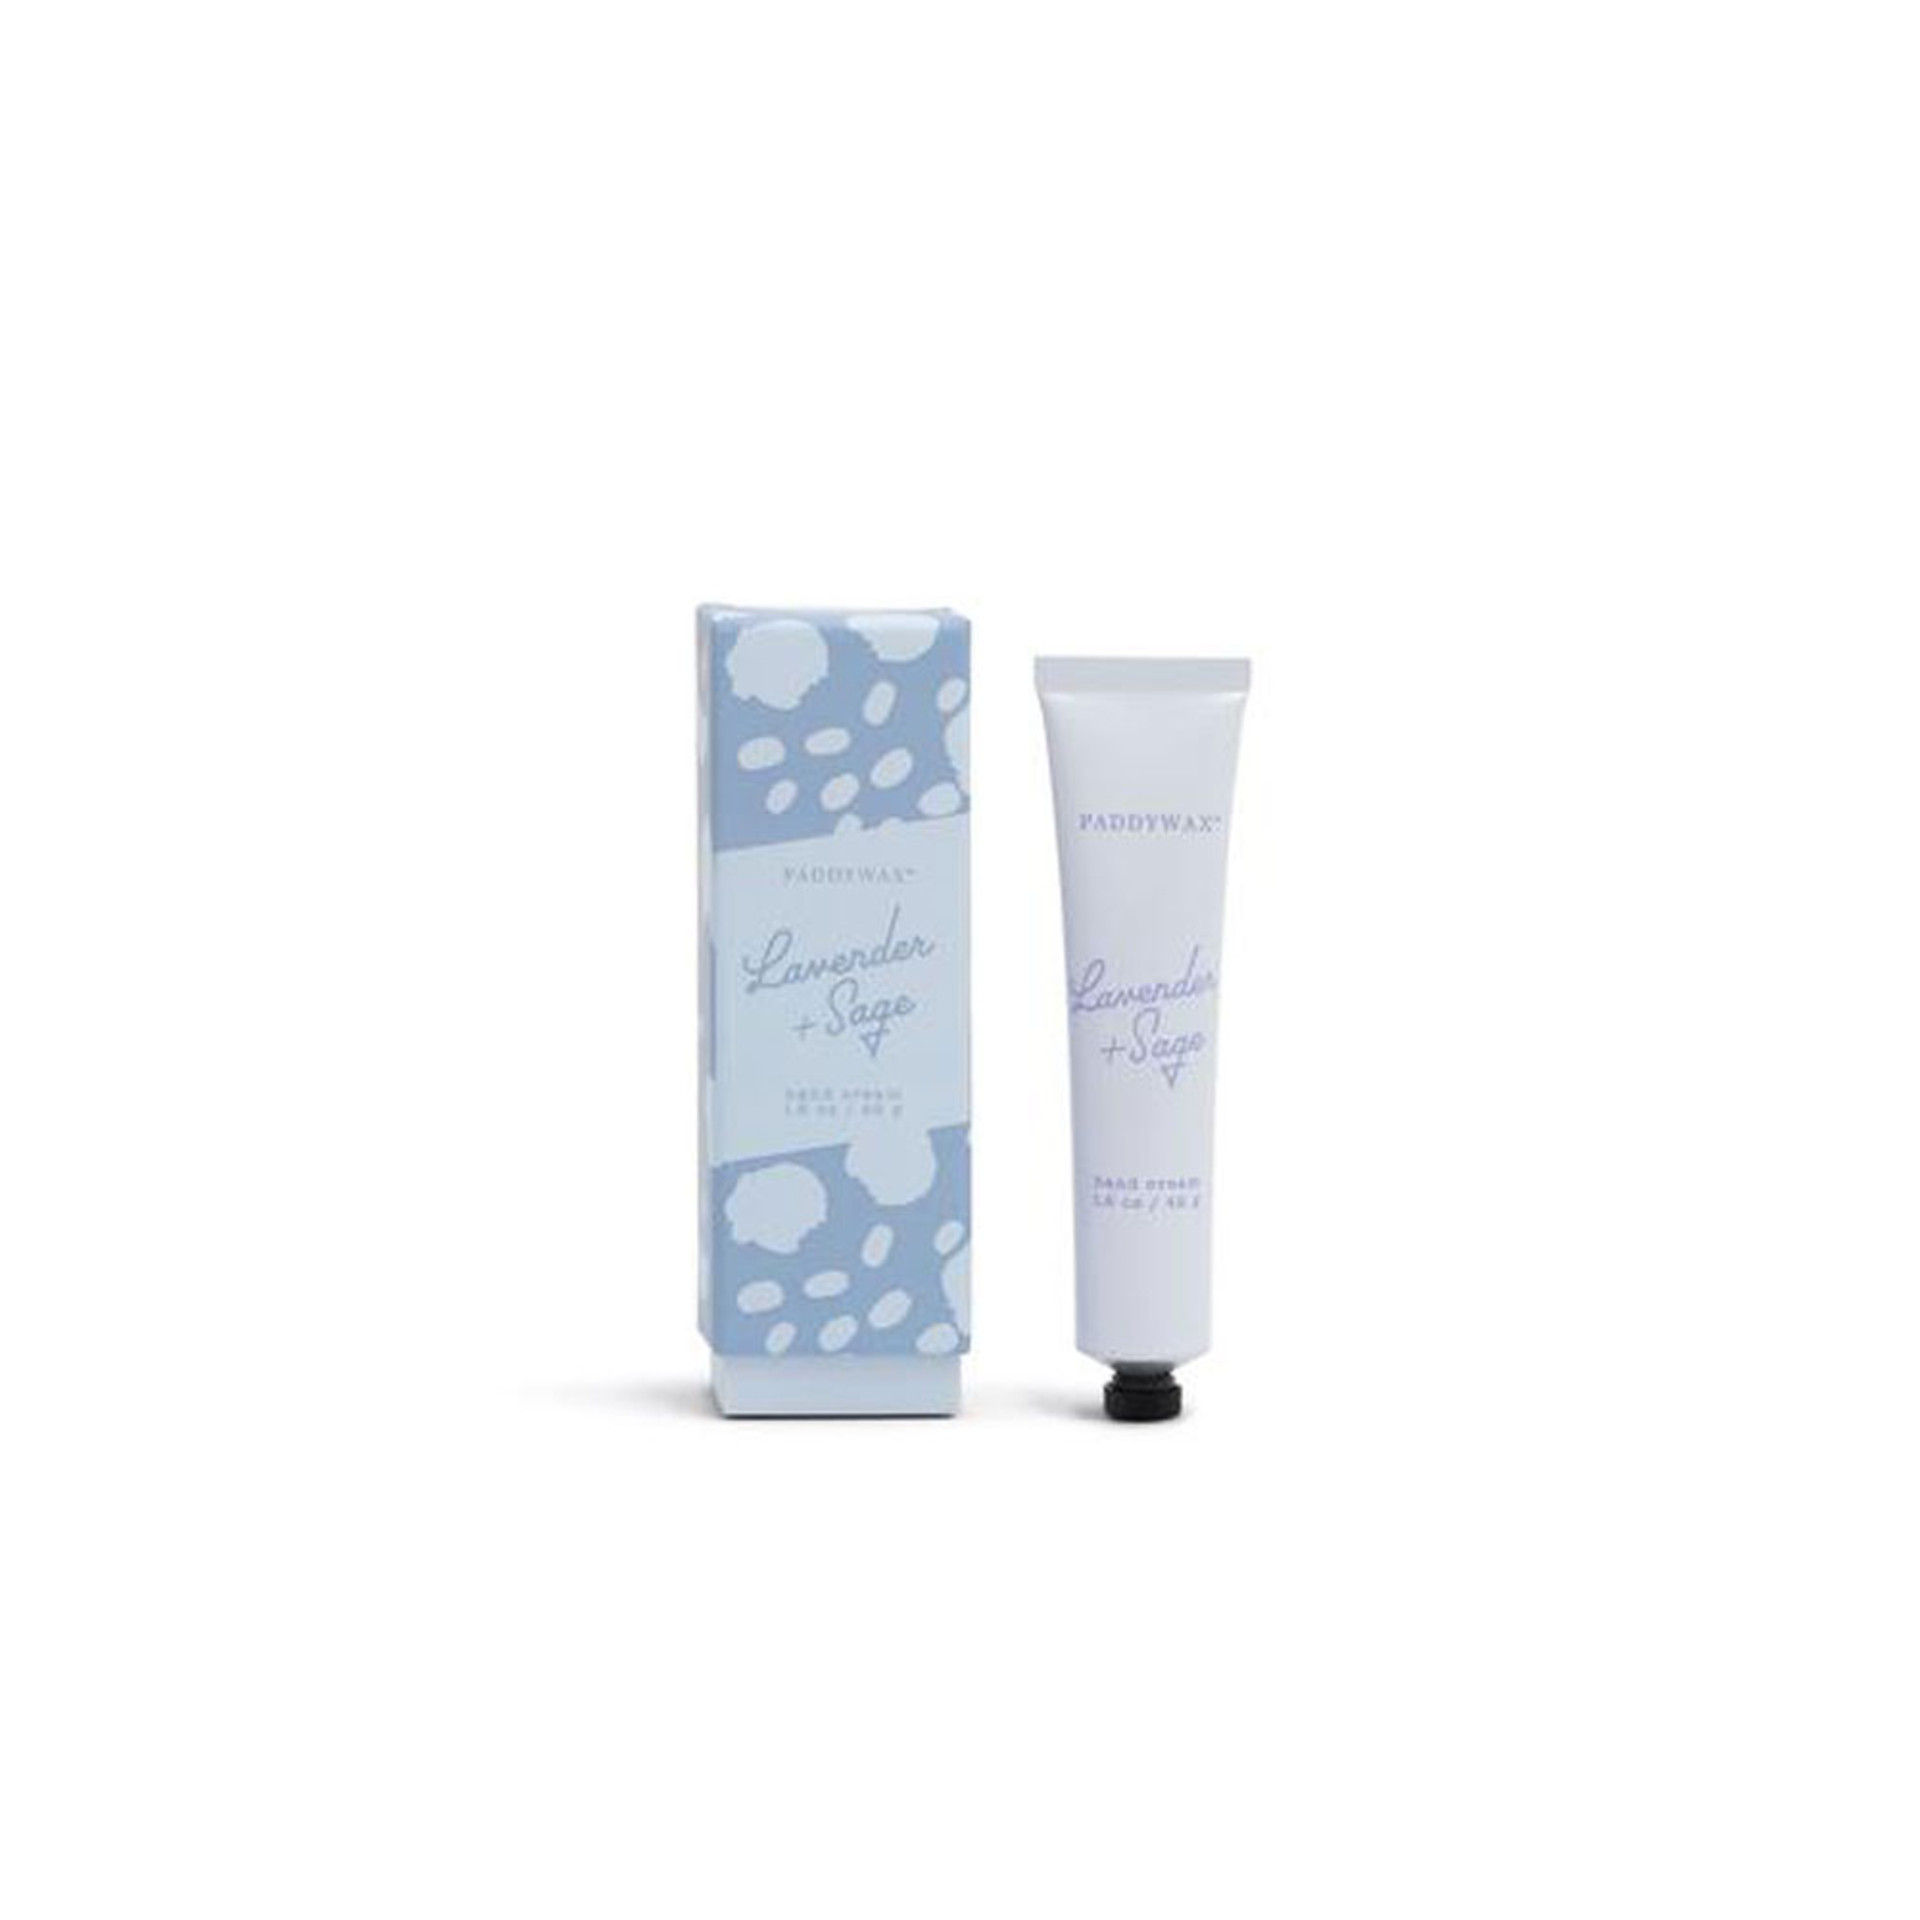 Paddywax Lavender Sage Hand Cream